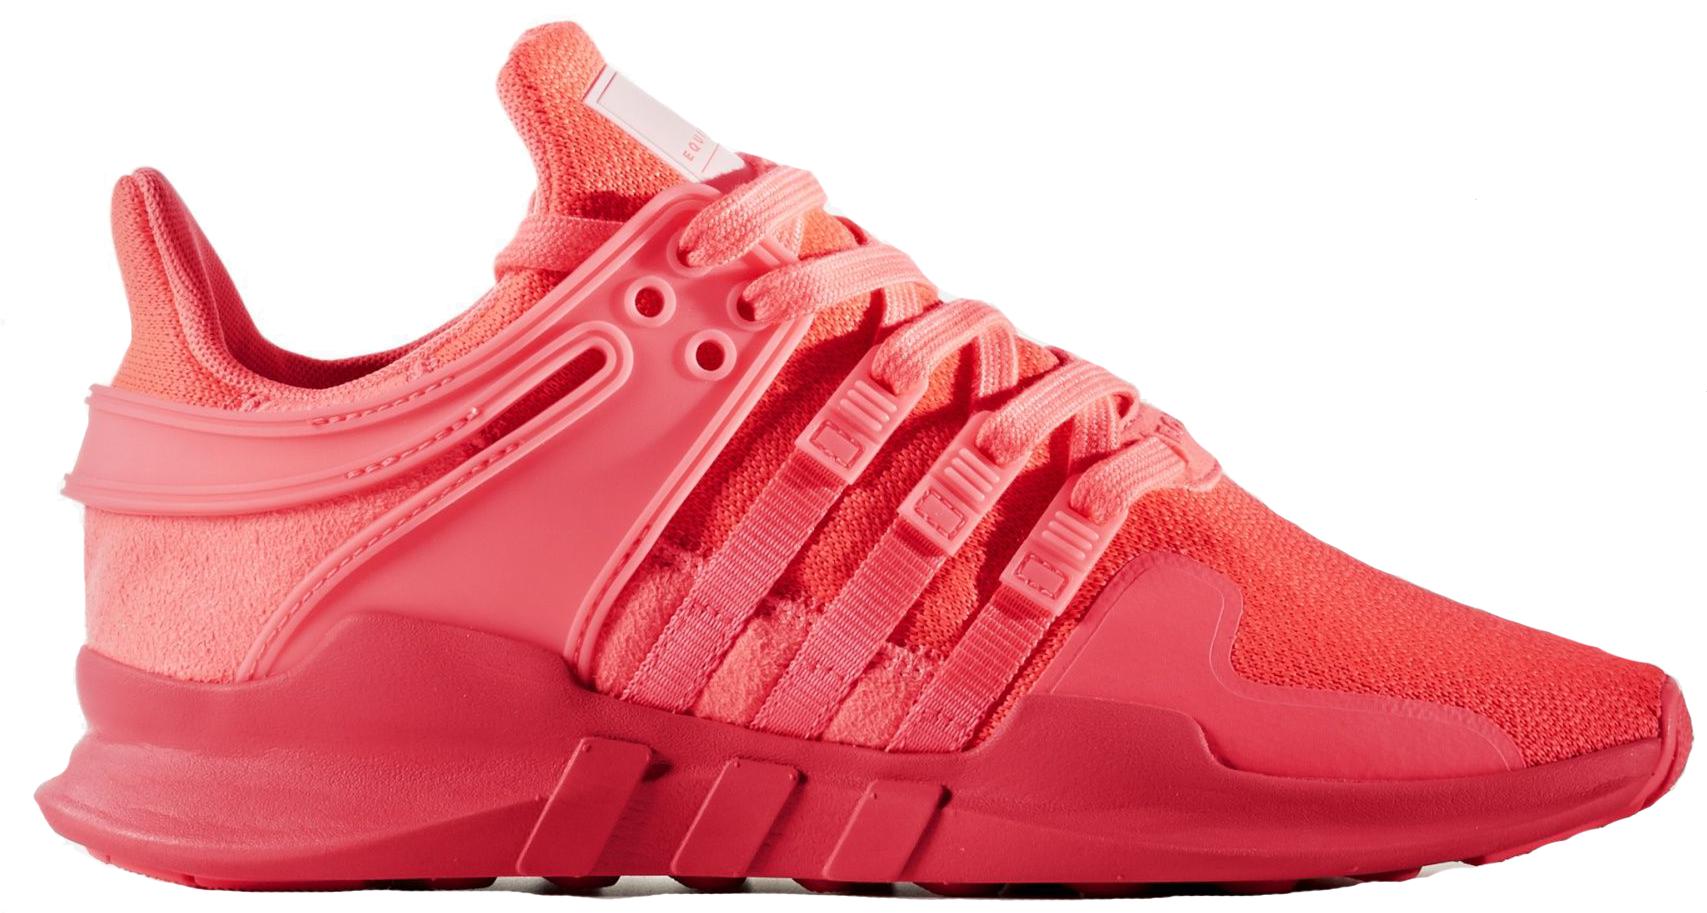 adidas EQT Support ADV Turbo Pink (W)